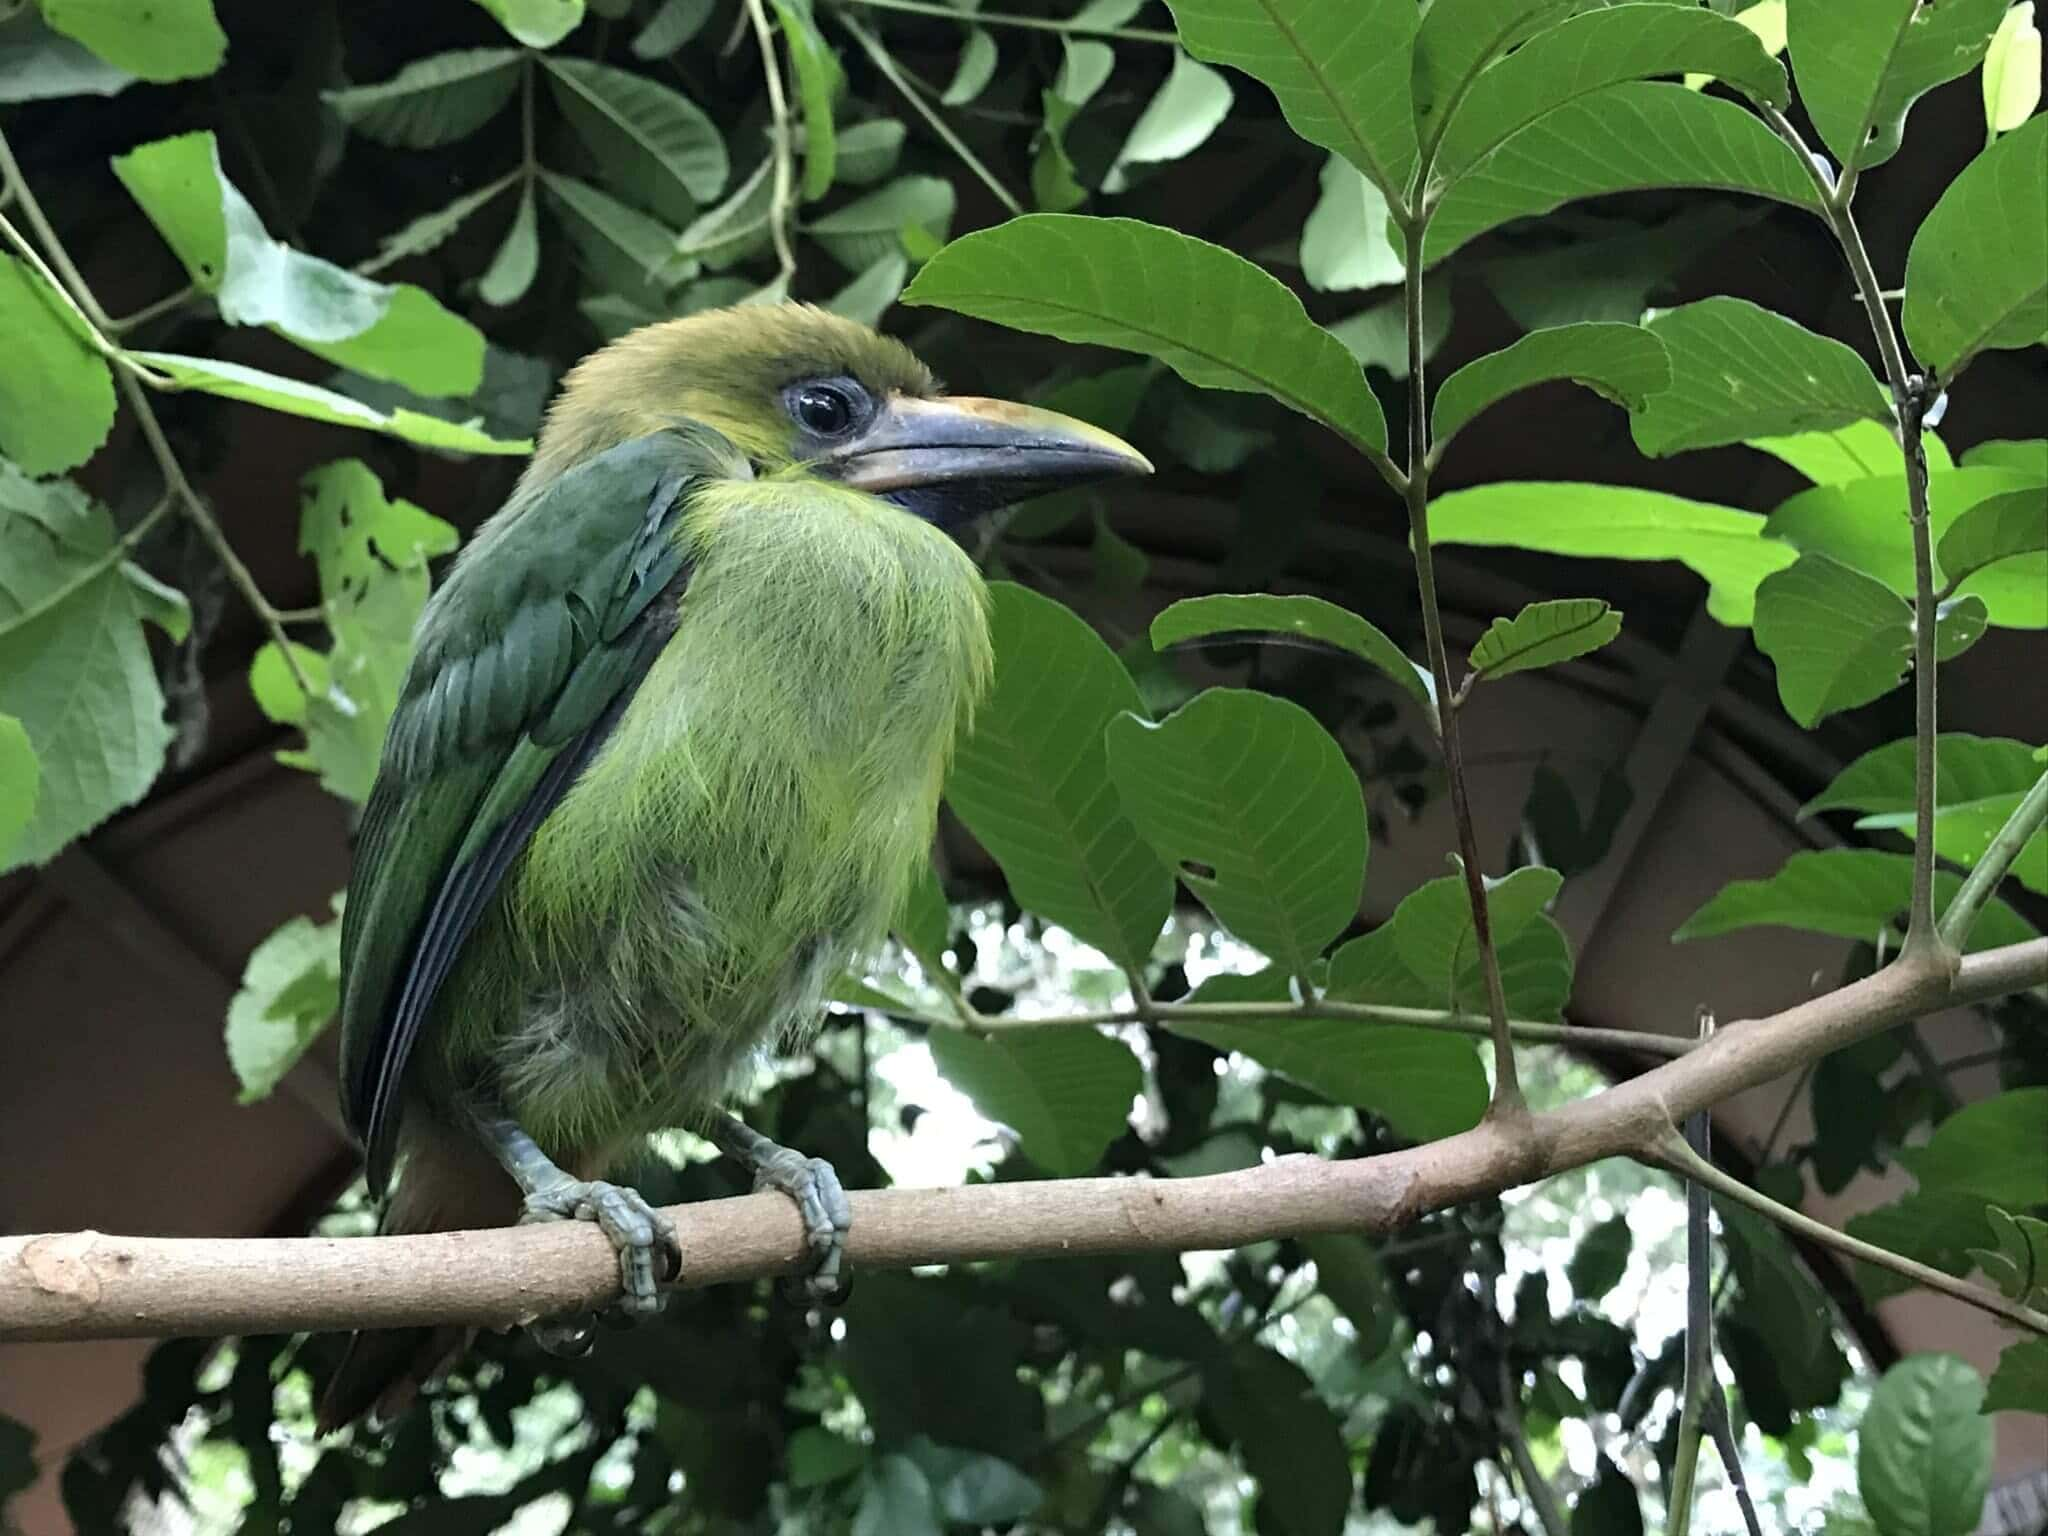 Emerald toucan rescue